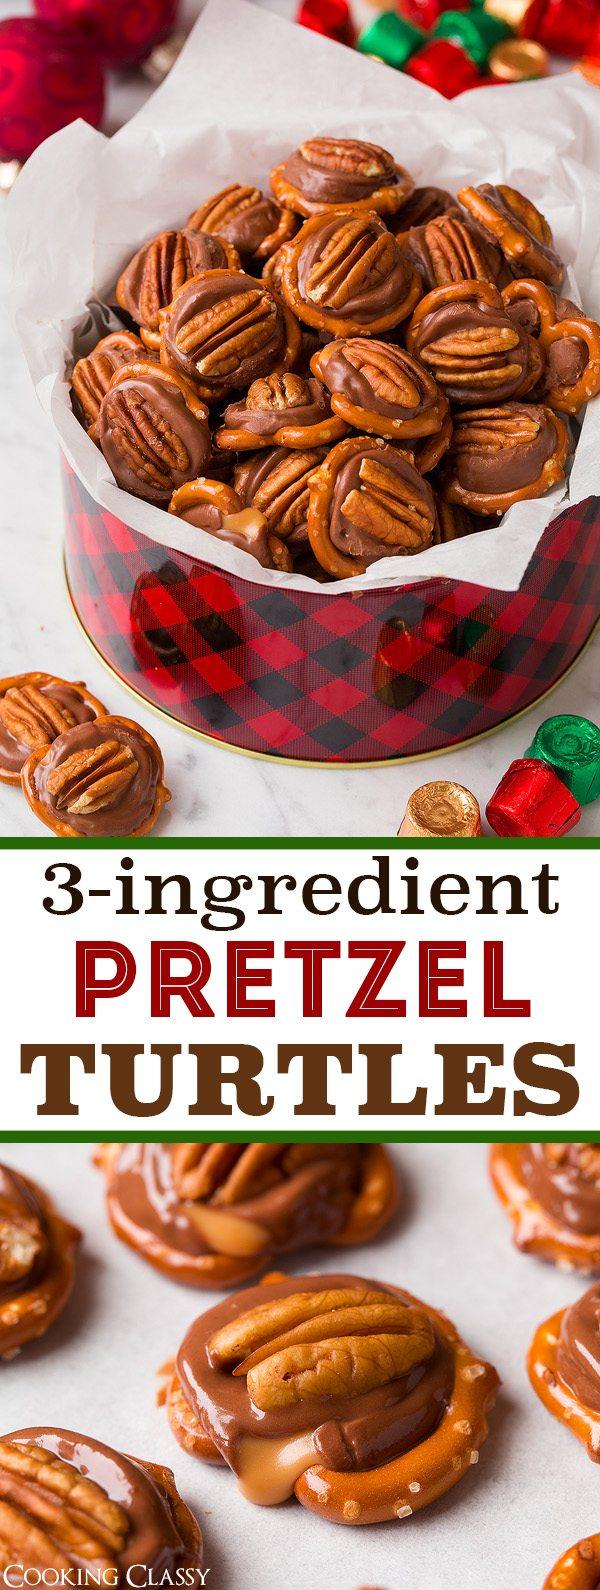 Pretzel Turtles (3 Ingredients) - Cooking Classy